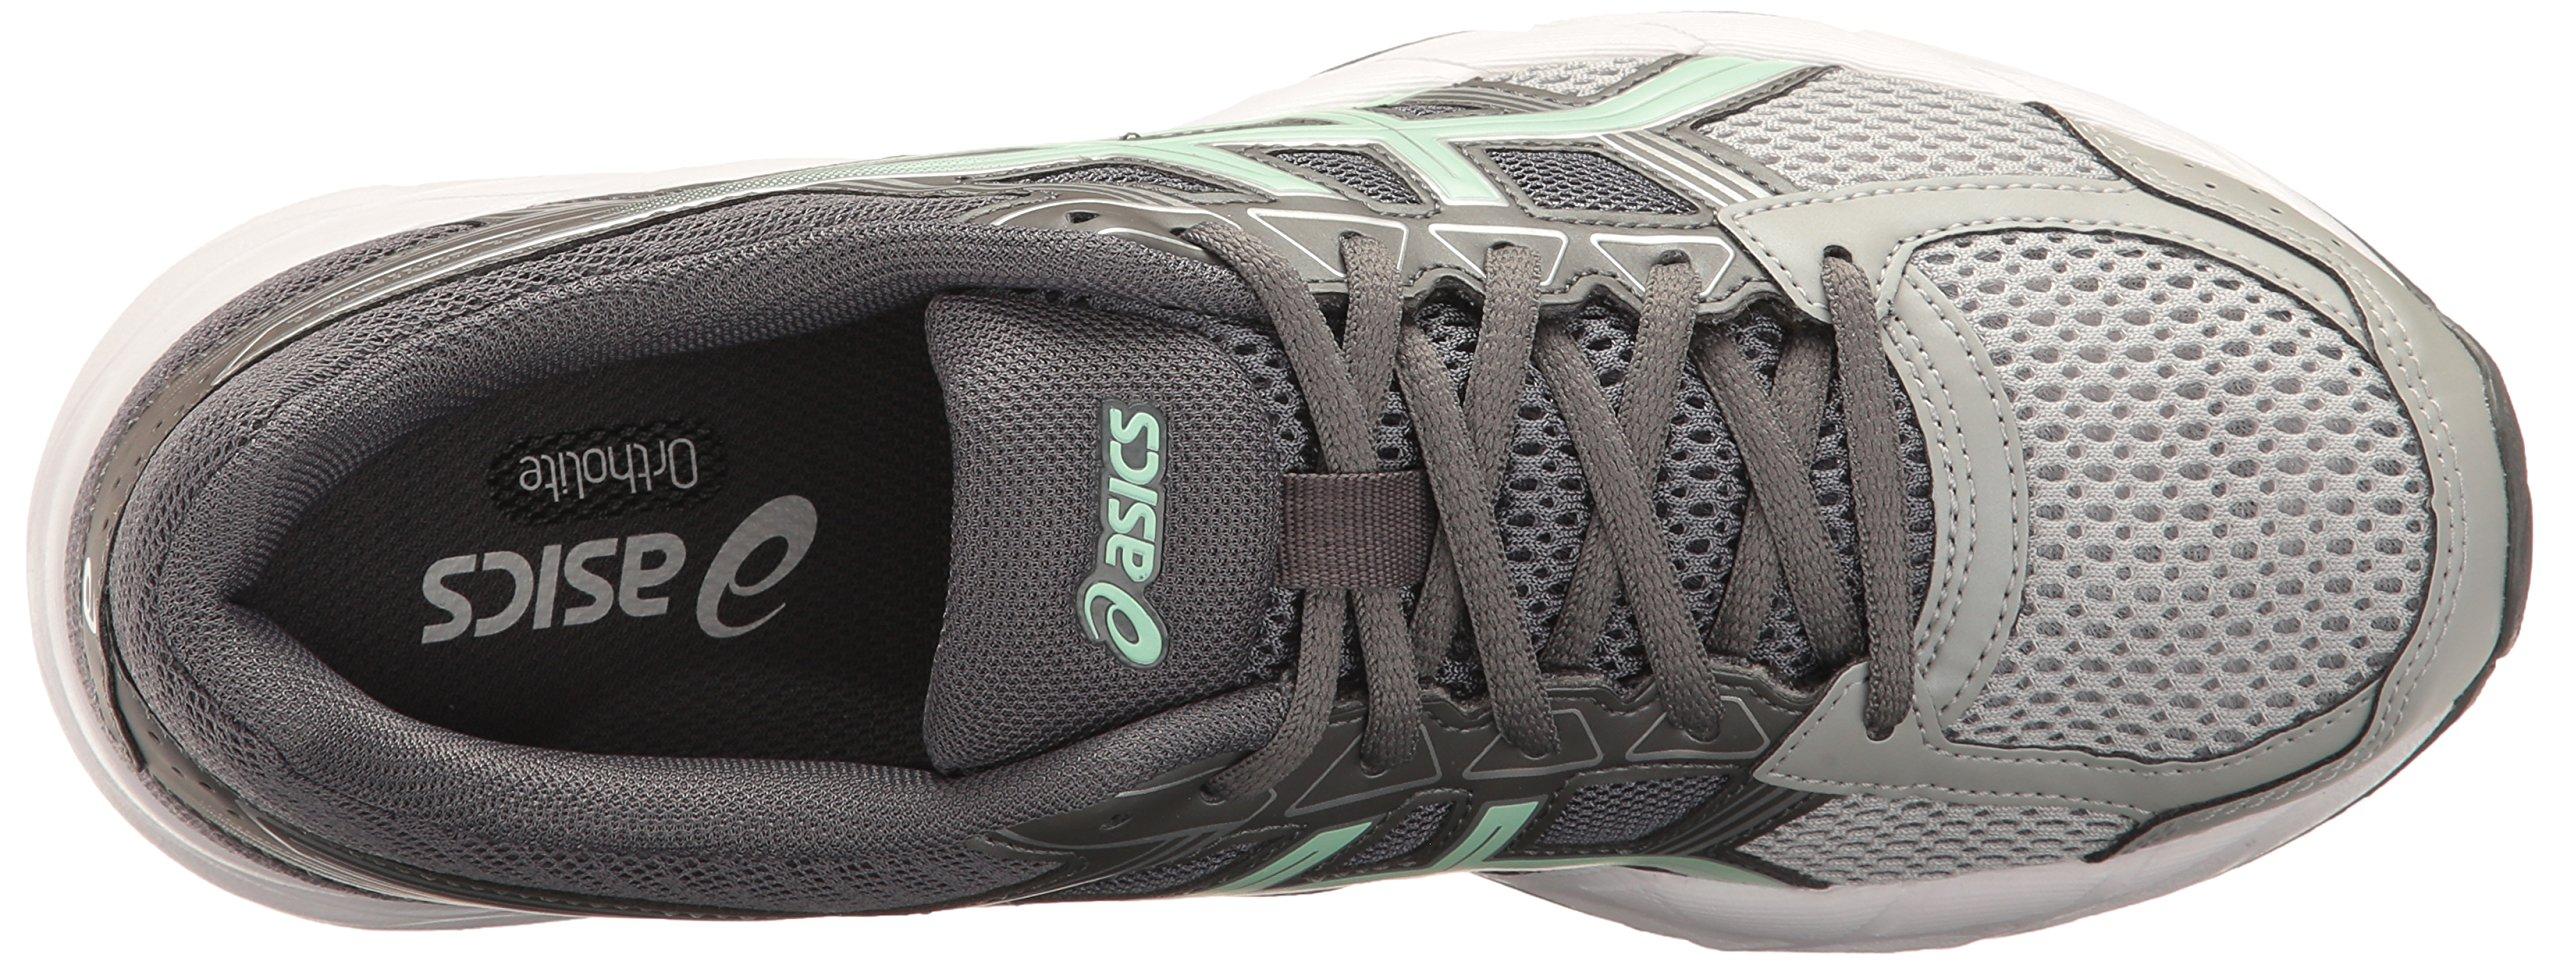 ASICS Womens Gel-Contend 4 Running Shoe, Mid Grey/Glacier Sea/Silver, 5 Medium US by ASICS (Image #8)